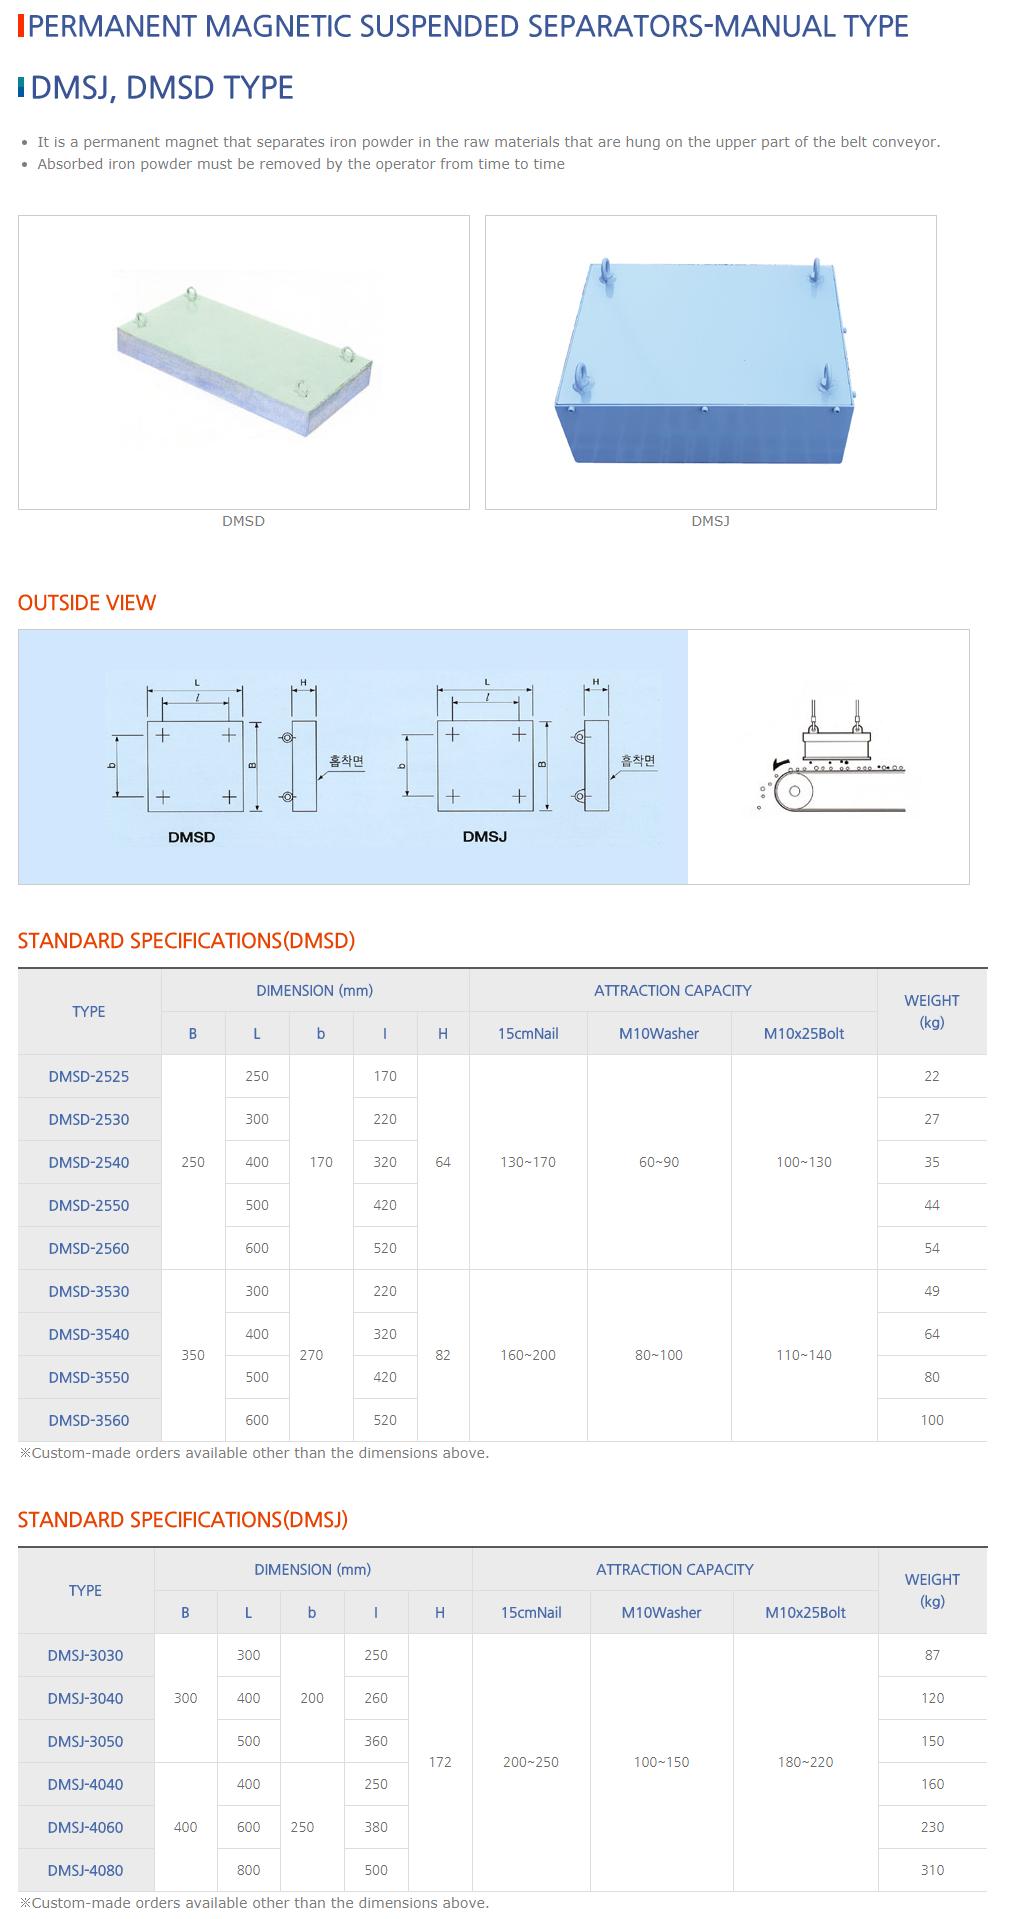 DAESUNG MARGNET Permanent Magnetic Suspended Separators (Manual Type) DMSJ/DMSD Type